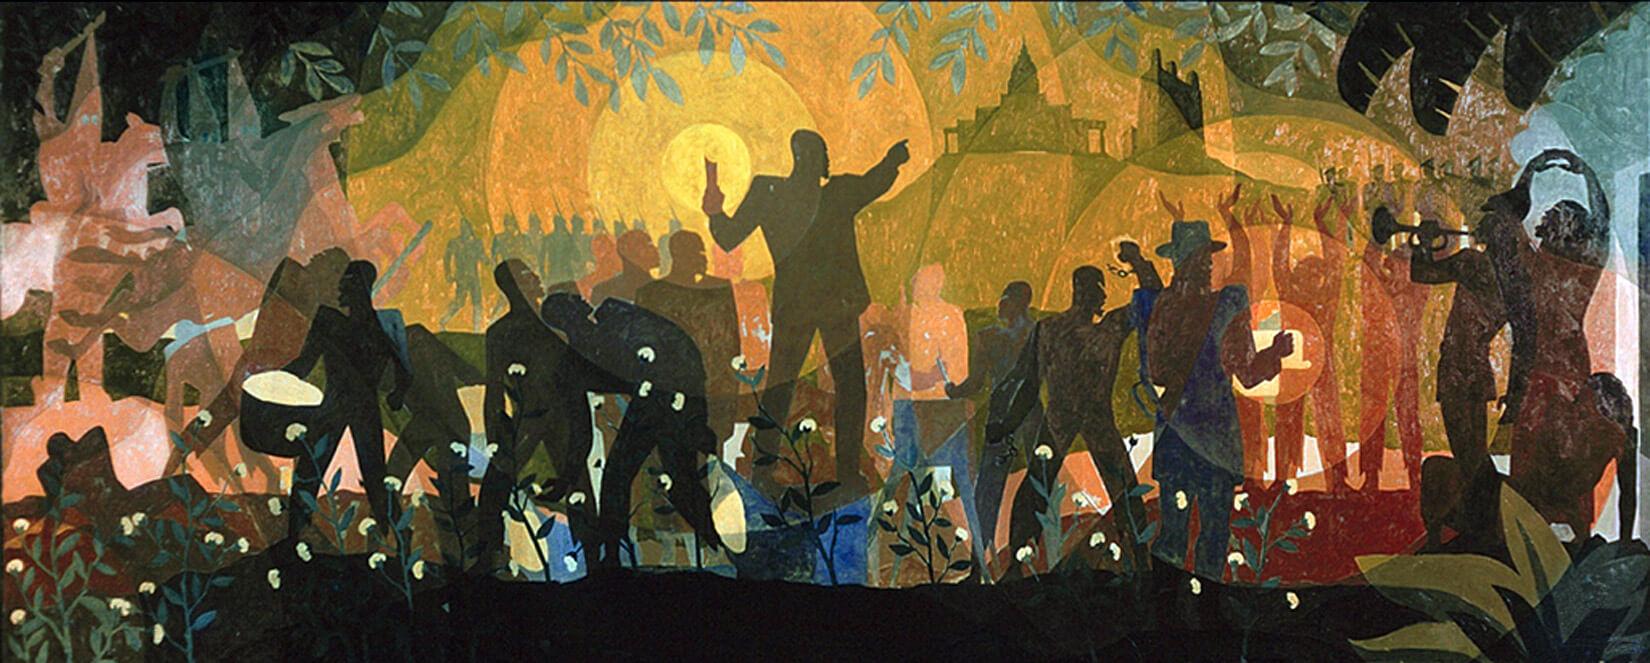 Douglas的代表作、壁畫系列《Aspects of Negro Life》,於1934年完成。